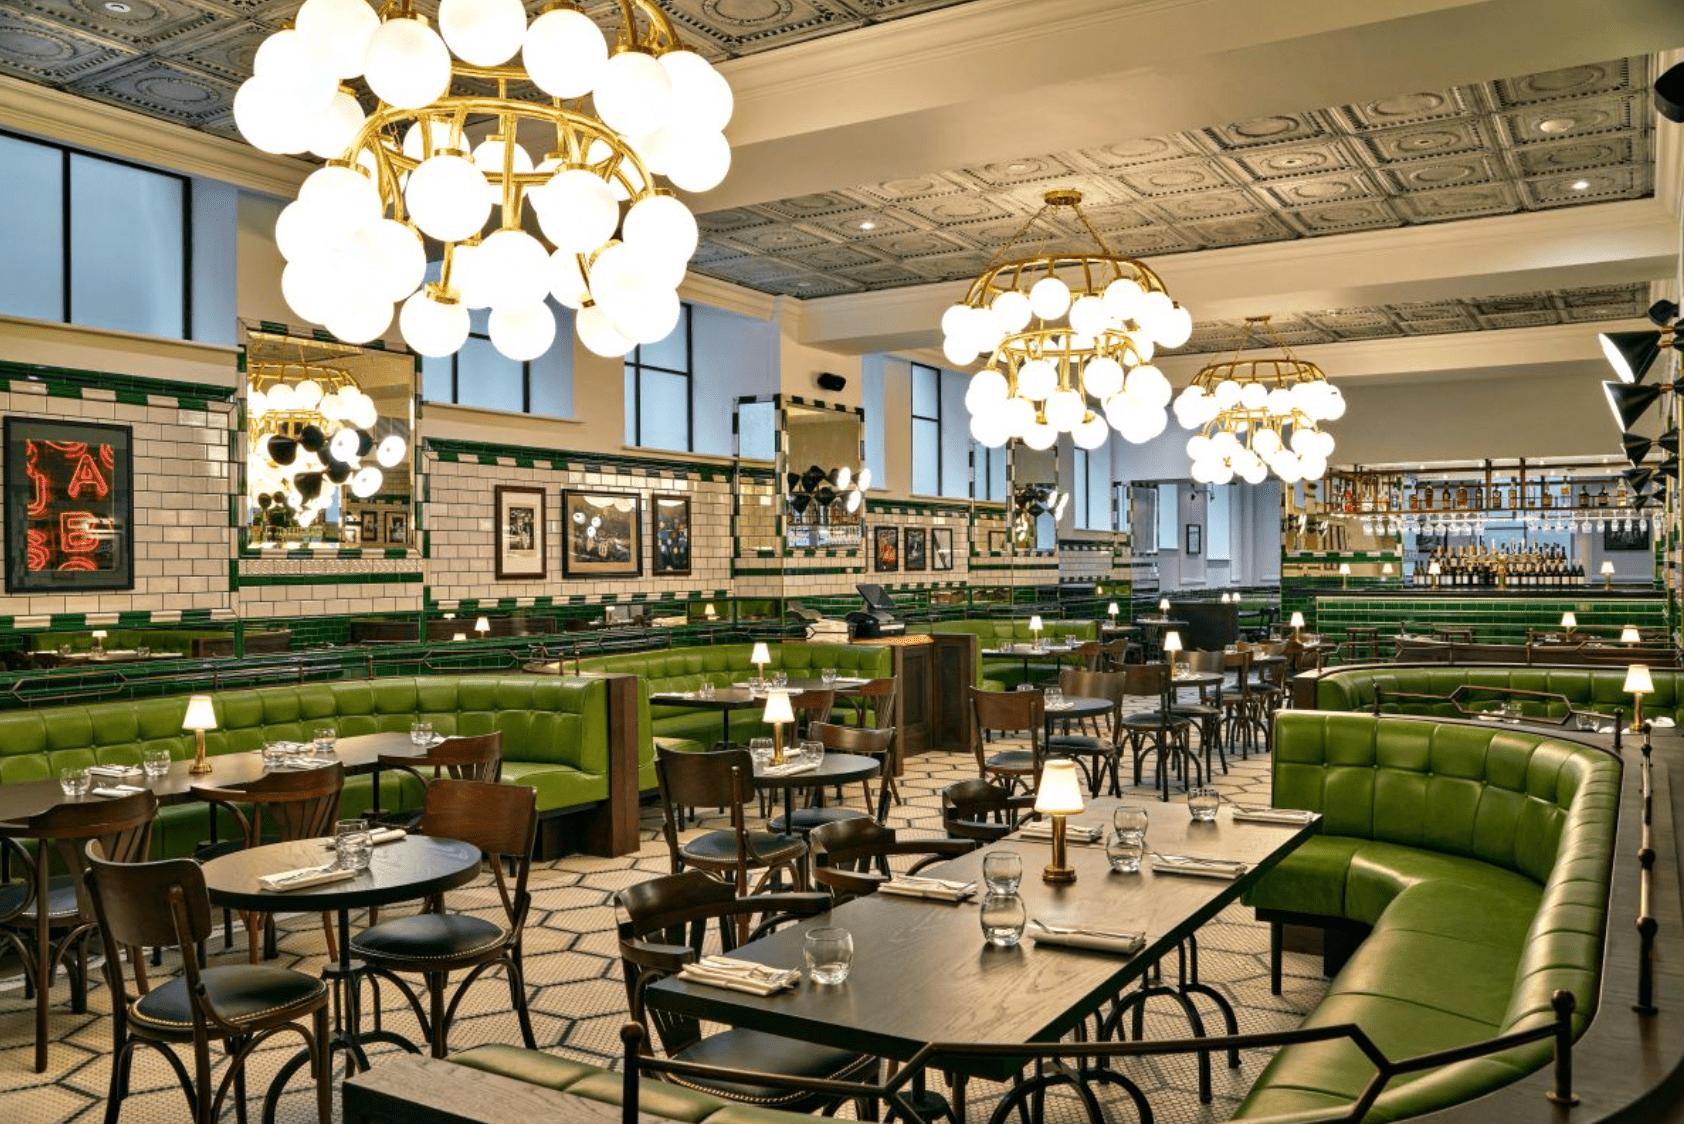 Isaac's Restaurant in Birmingham